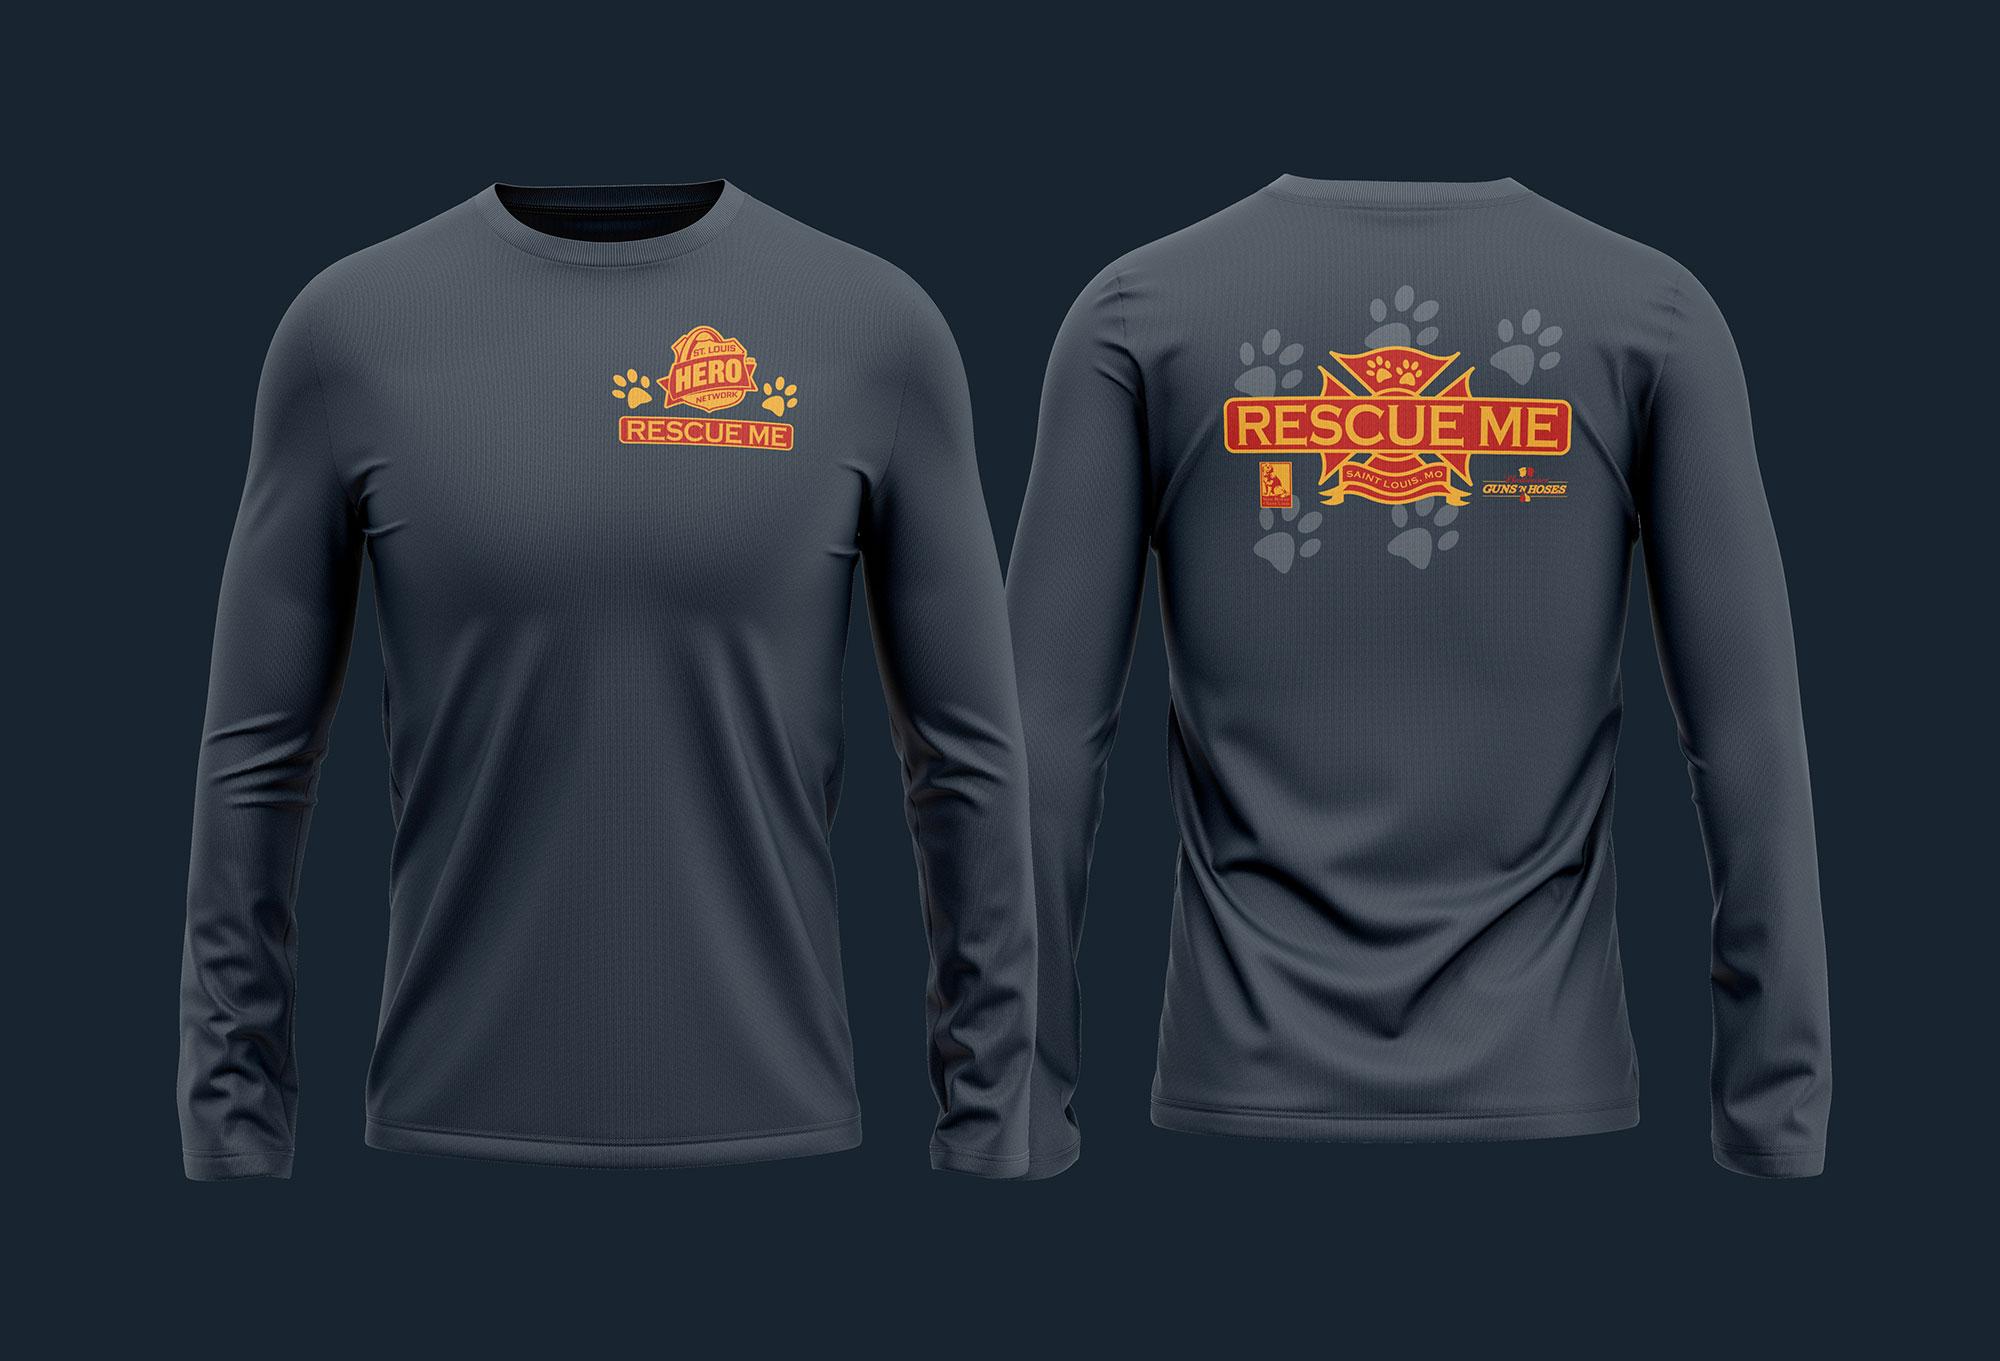 STL Hero Rescue Me shirt design